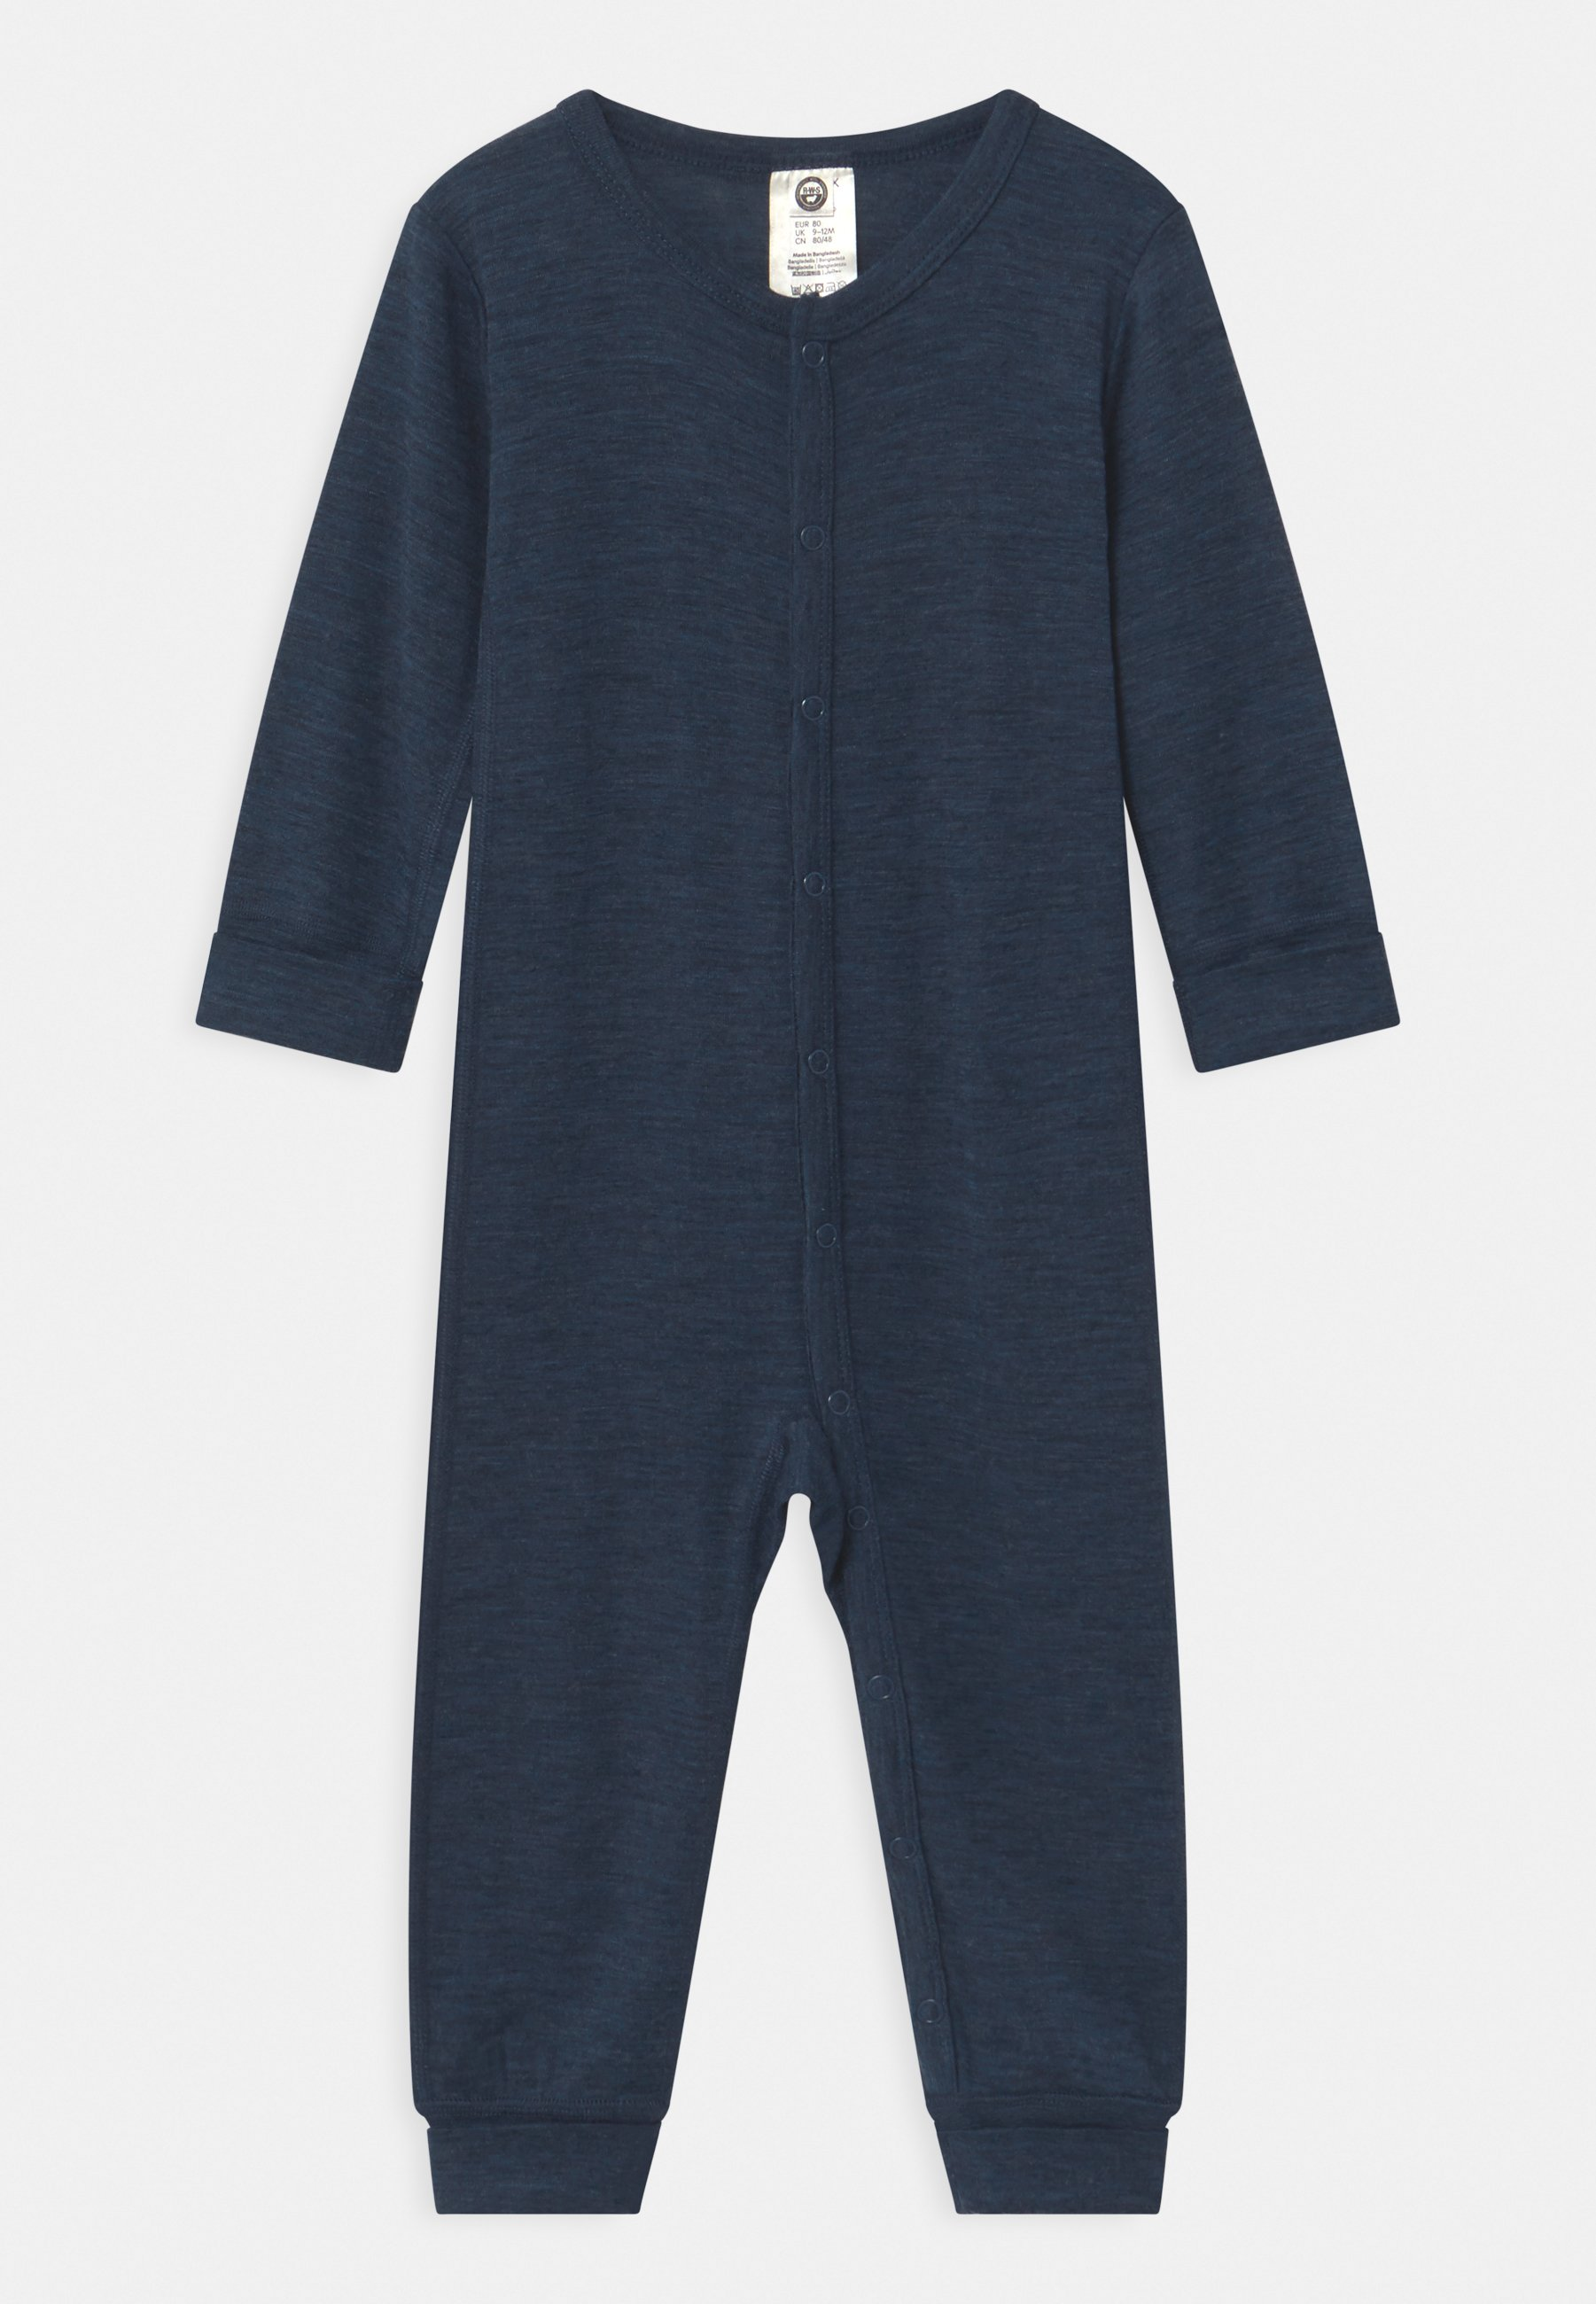 Kids ONESIES BABY UNISEX - Pyjamas